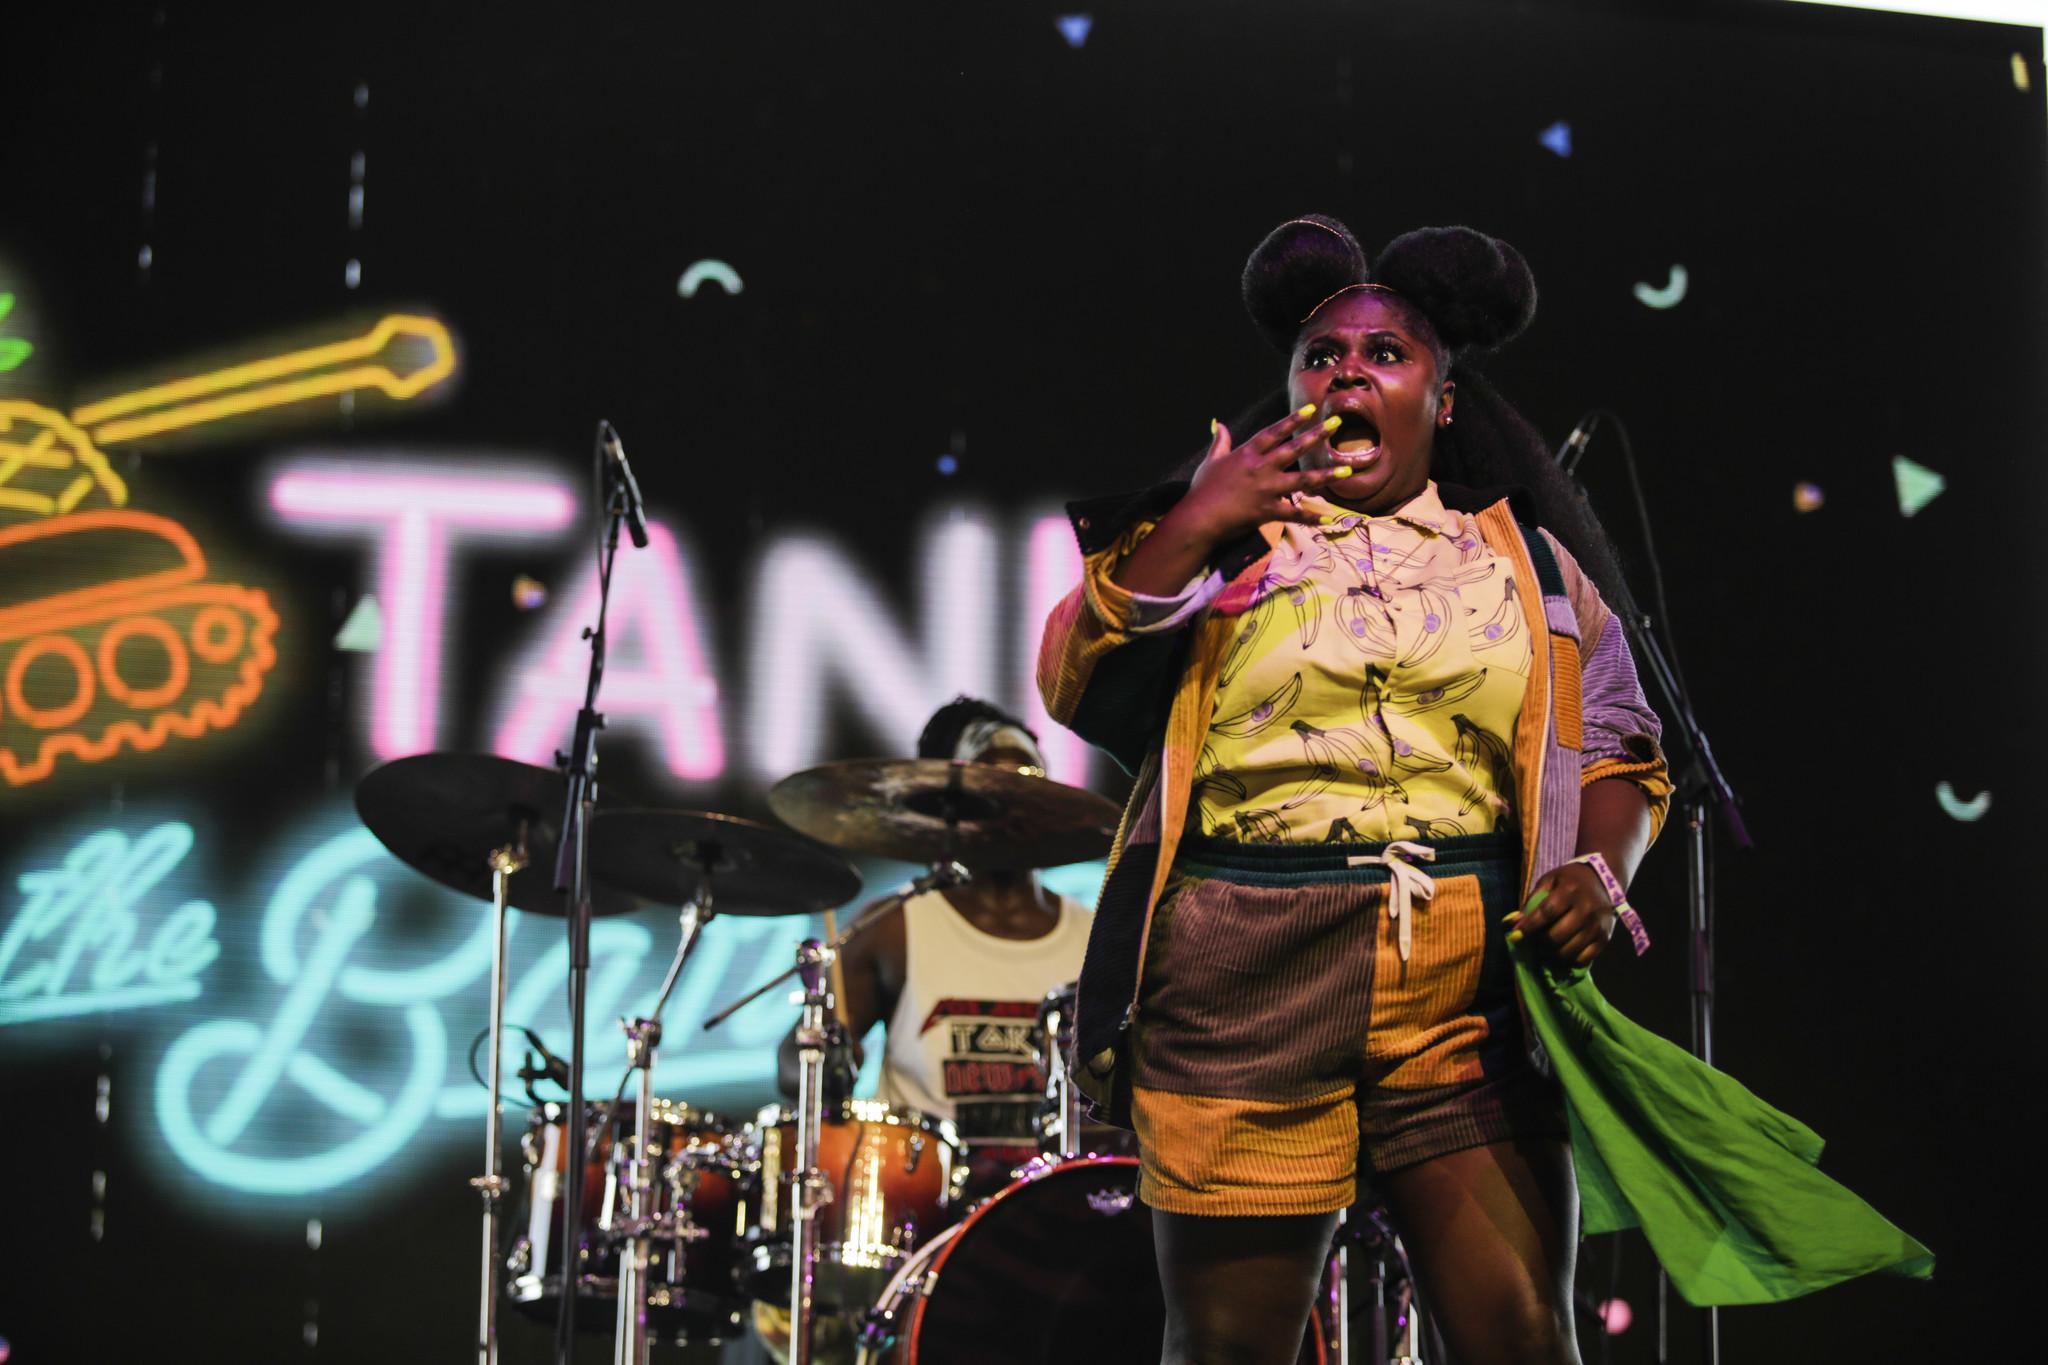 INDIO,CA — FRIDAY, APRIL 20, 2018-- Tanks the Bangas performs at Coachella week two. (Maria Alejand